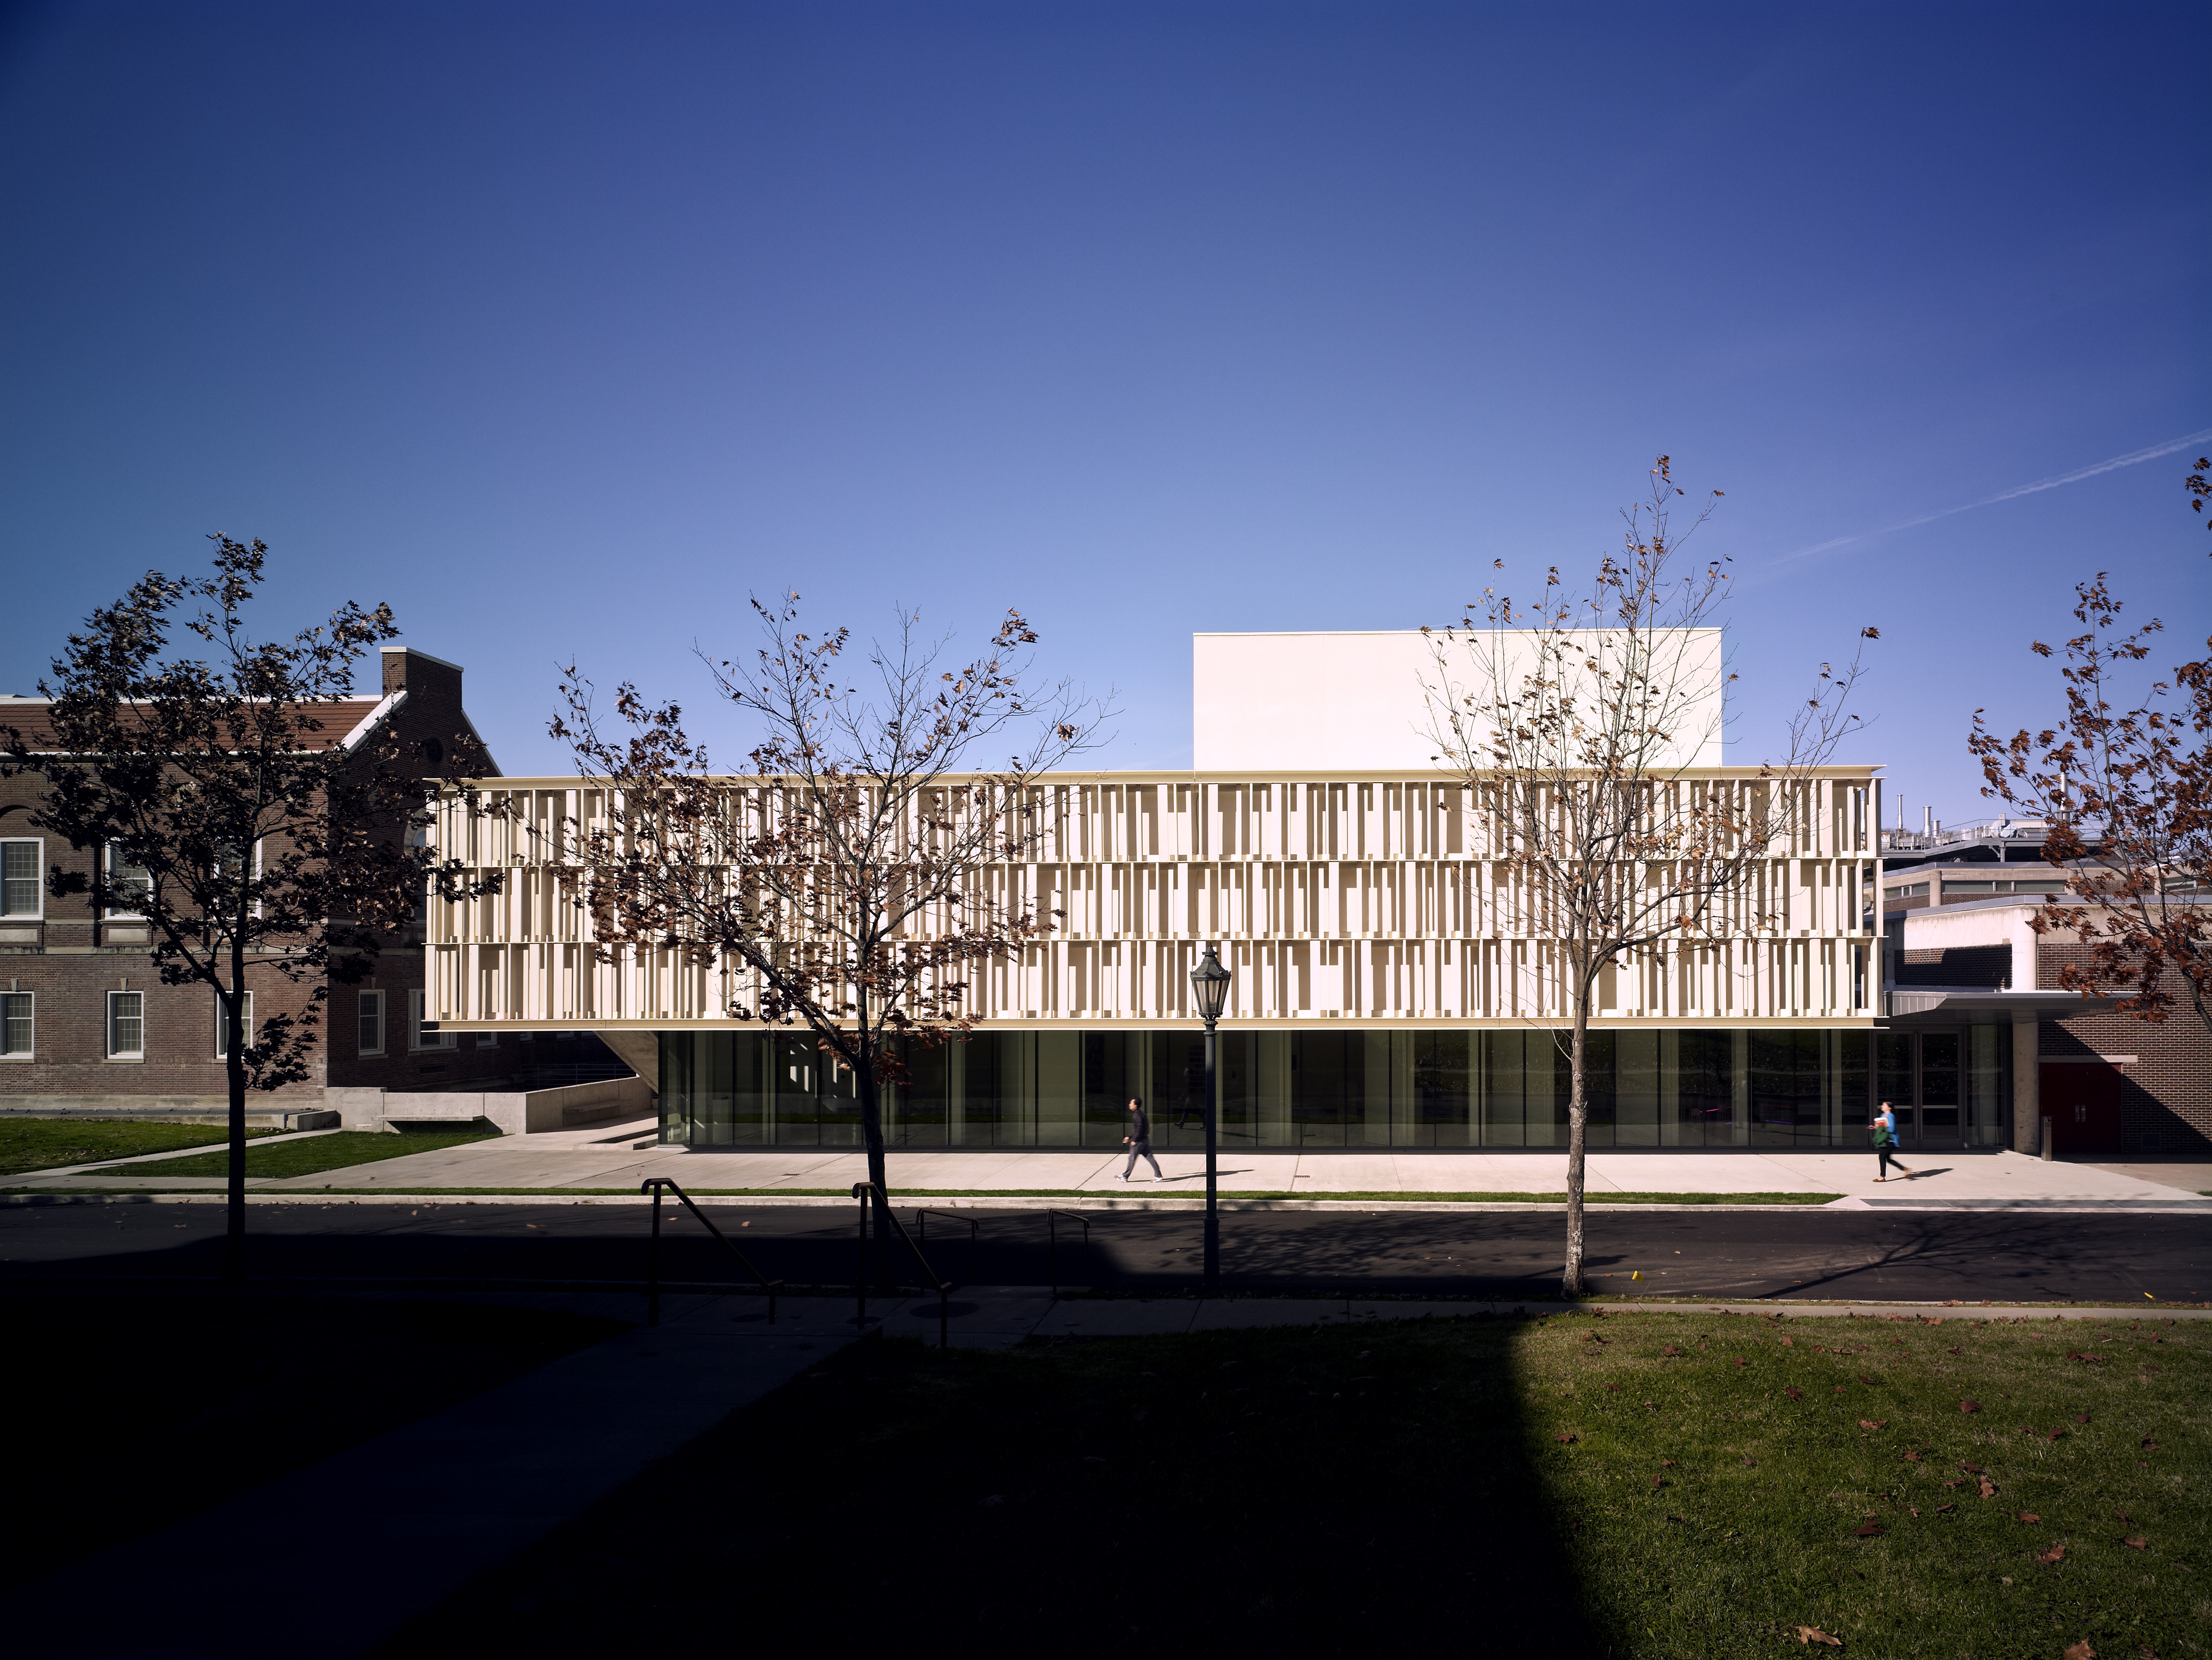 Mcgee Art Pavilion School Of Art And Design New York